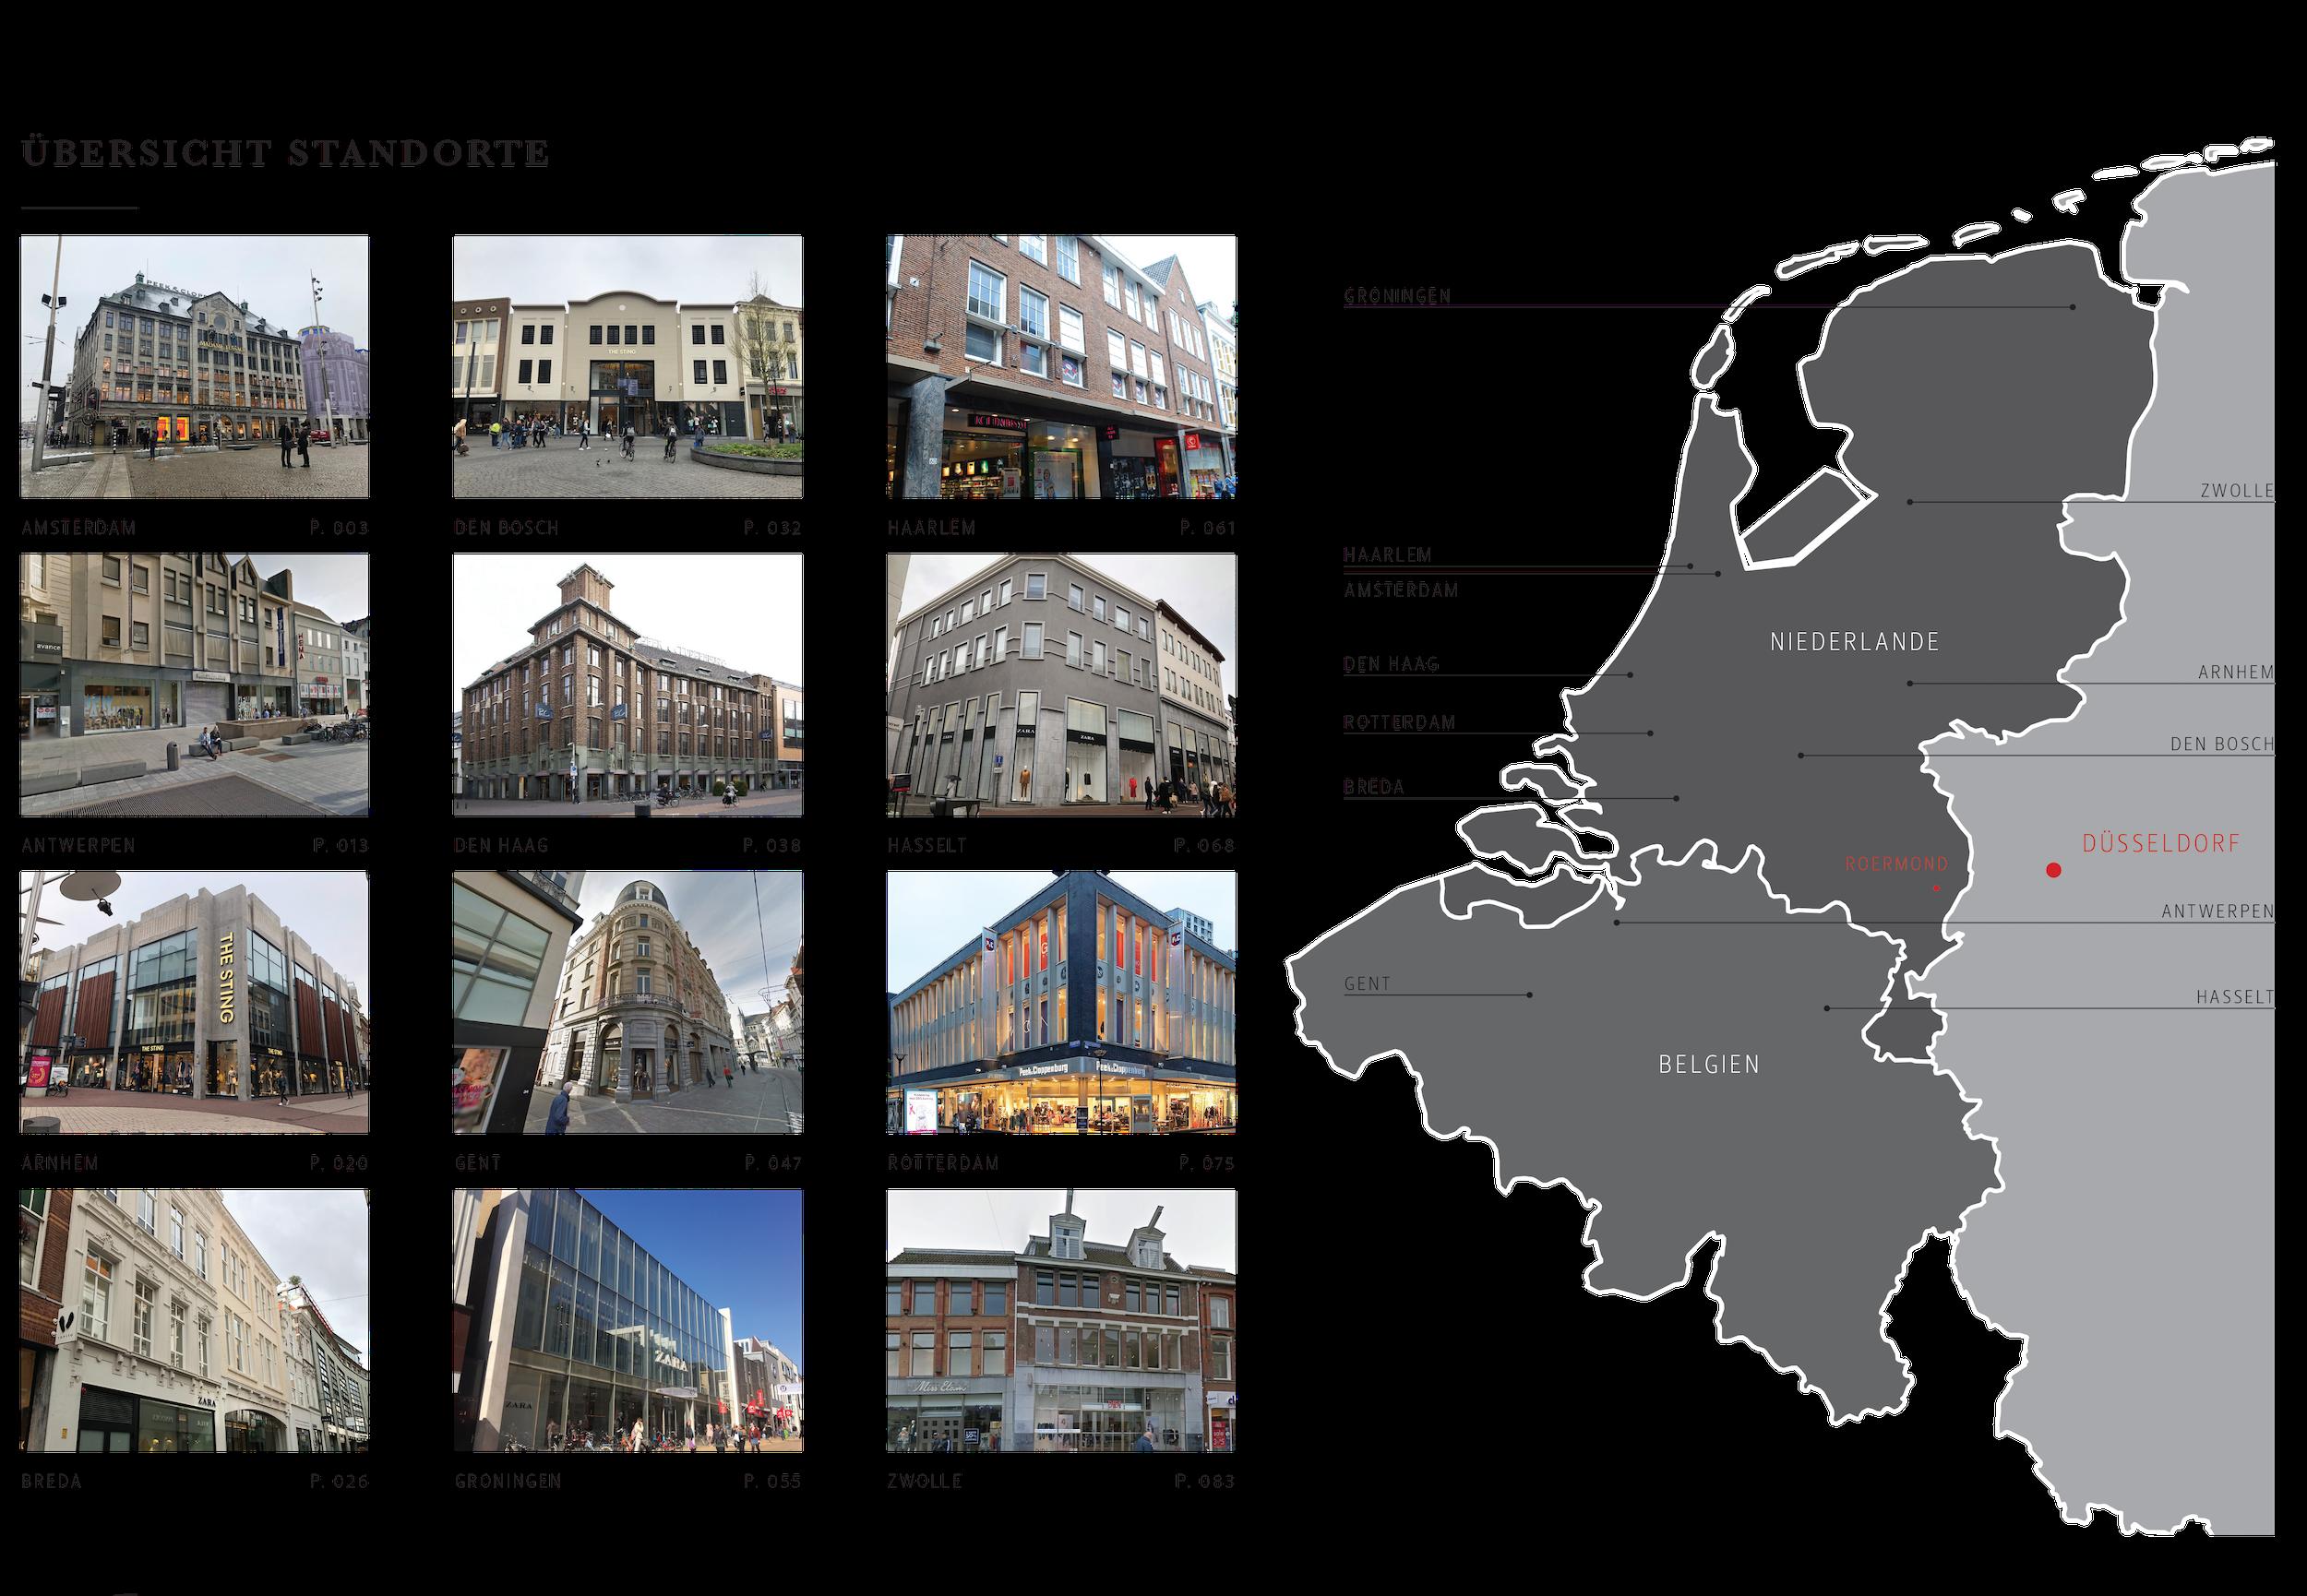 Peek & Cloppenburg Netherlands and Belgium